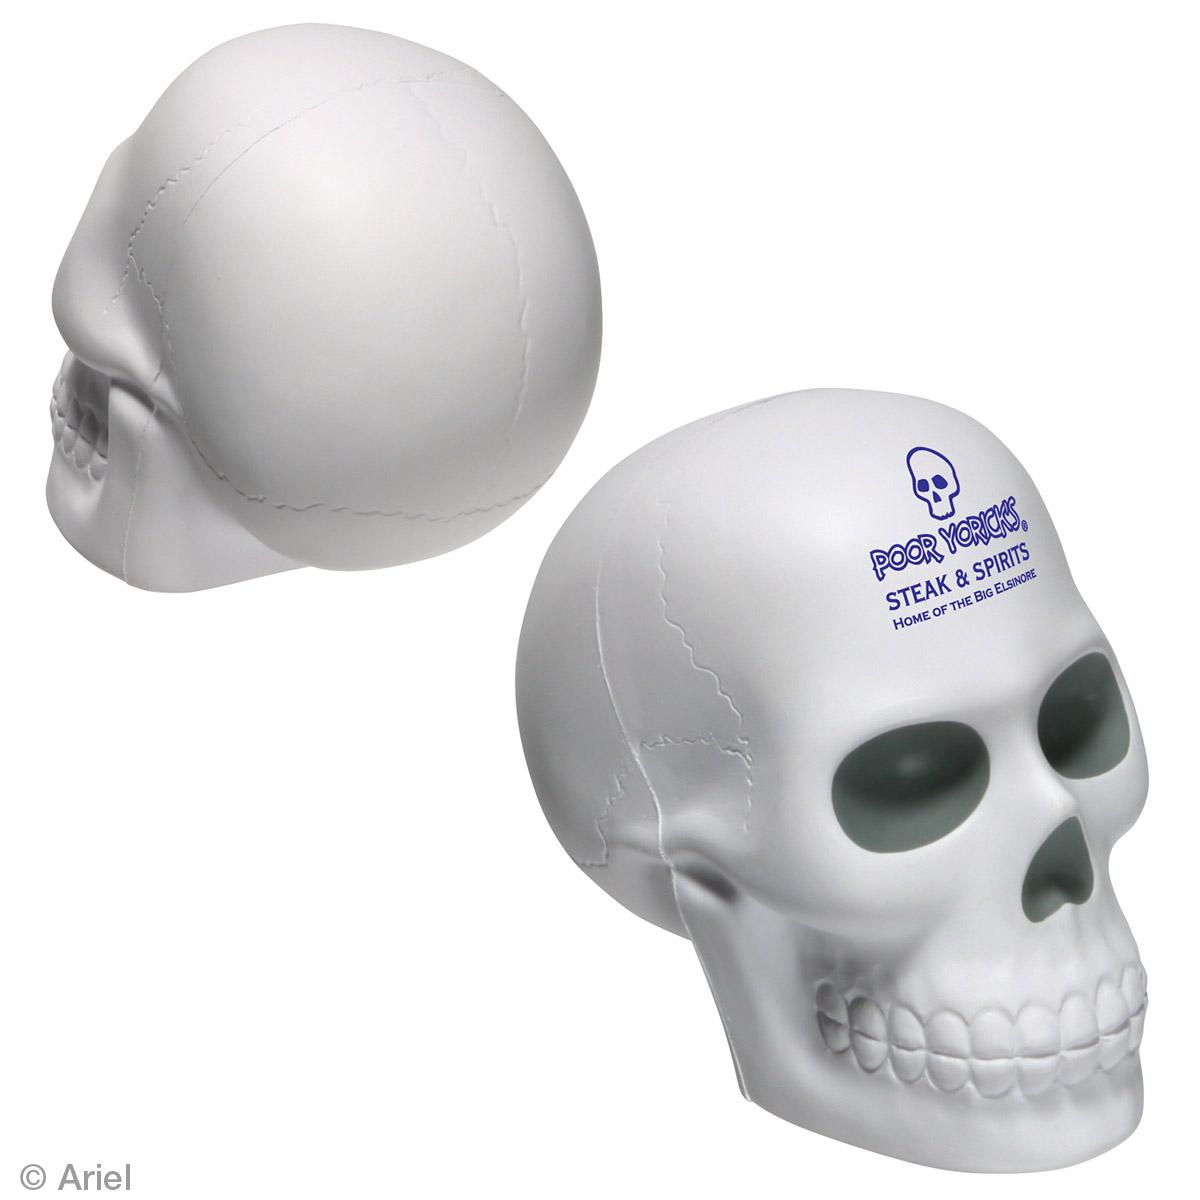 532e57f4c9eaa1 Skull Stress Reliever - LAN-SK07